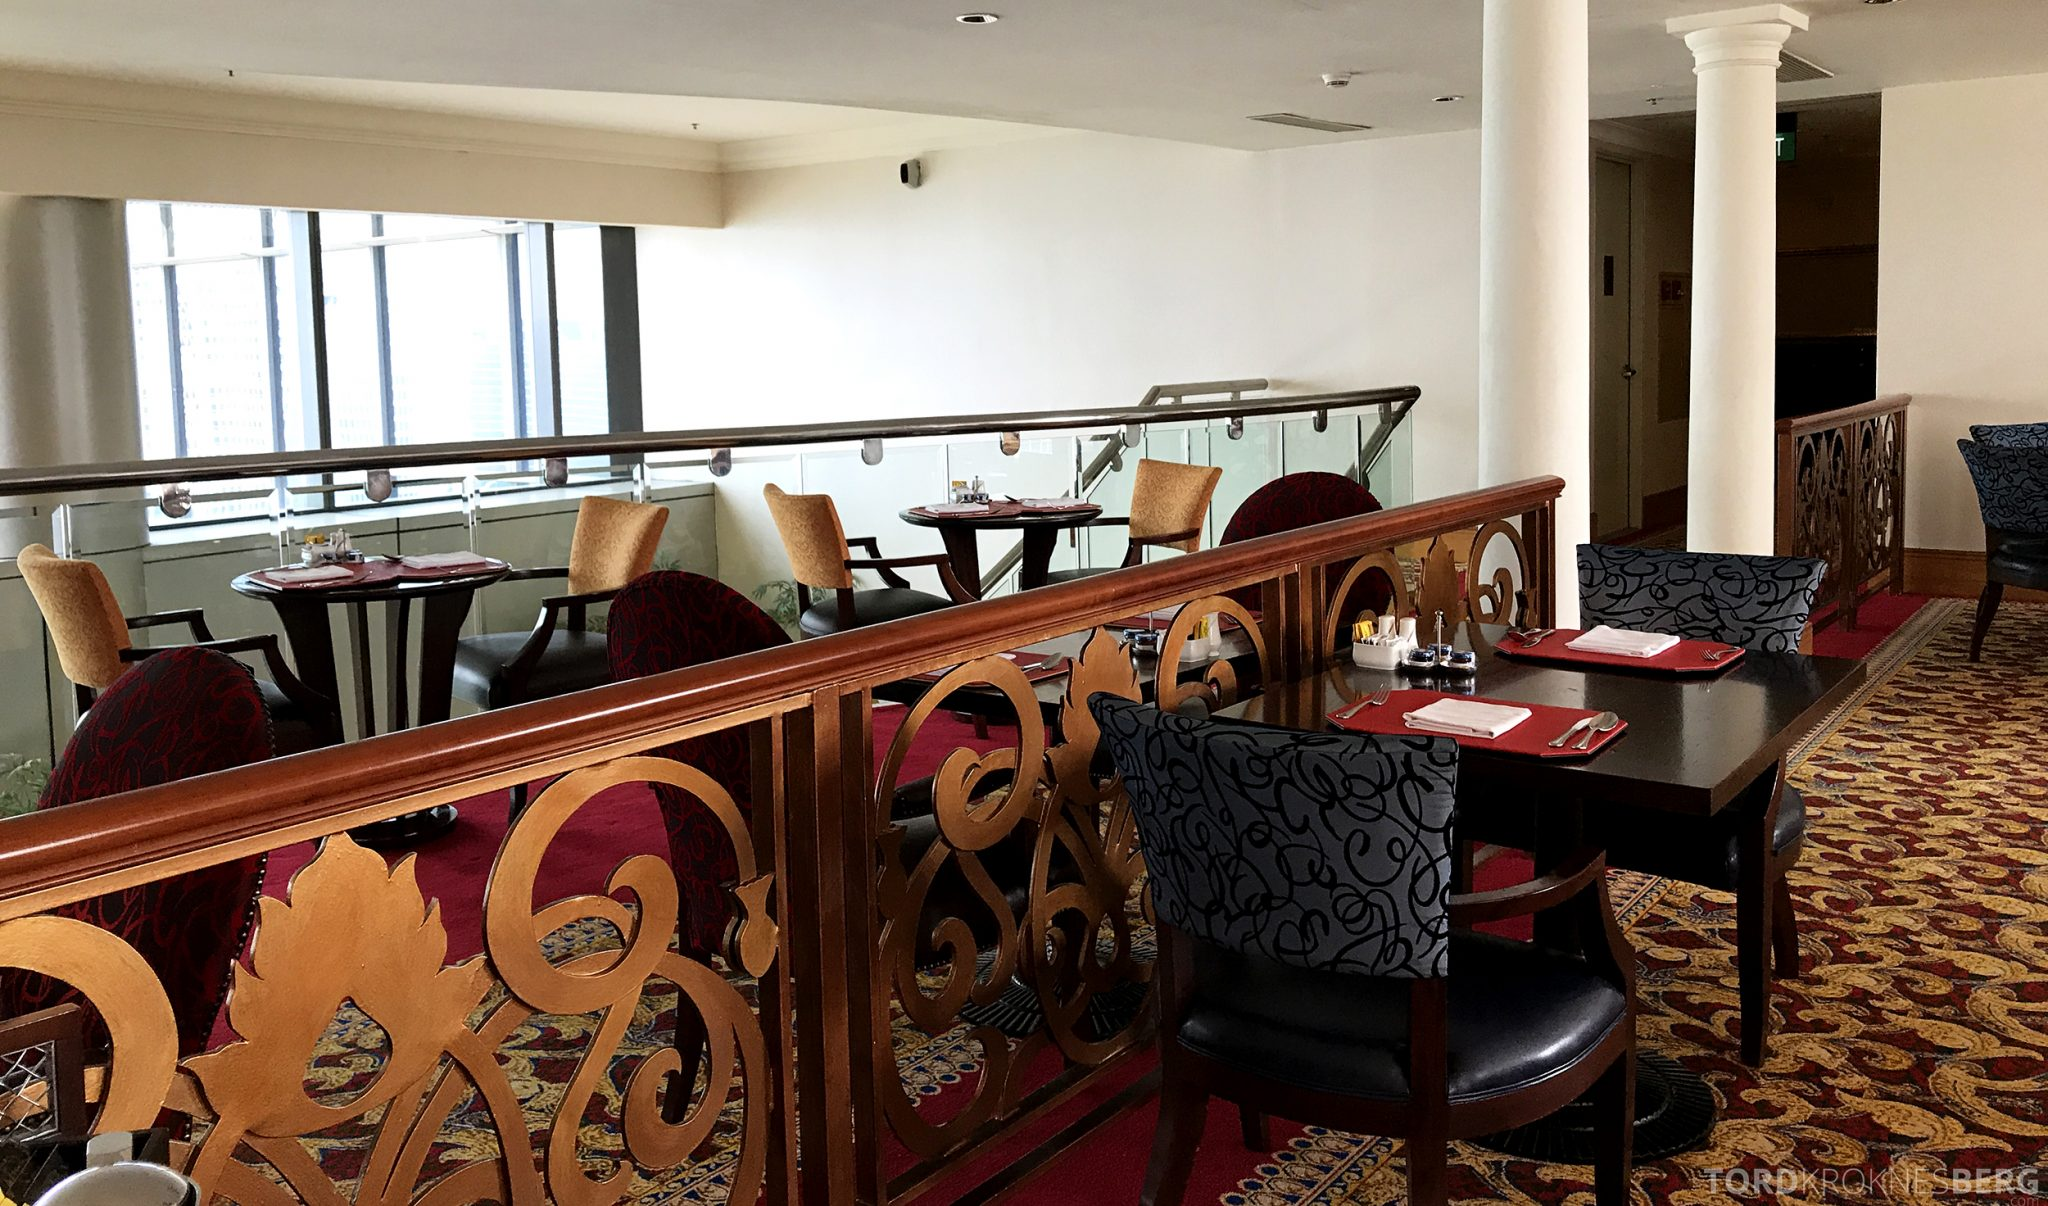 Ritz-Carlton Jakarta Club Lounge detaljer